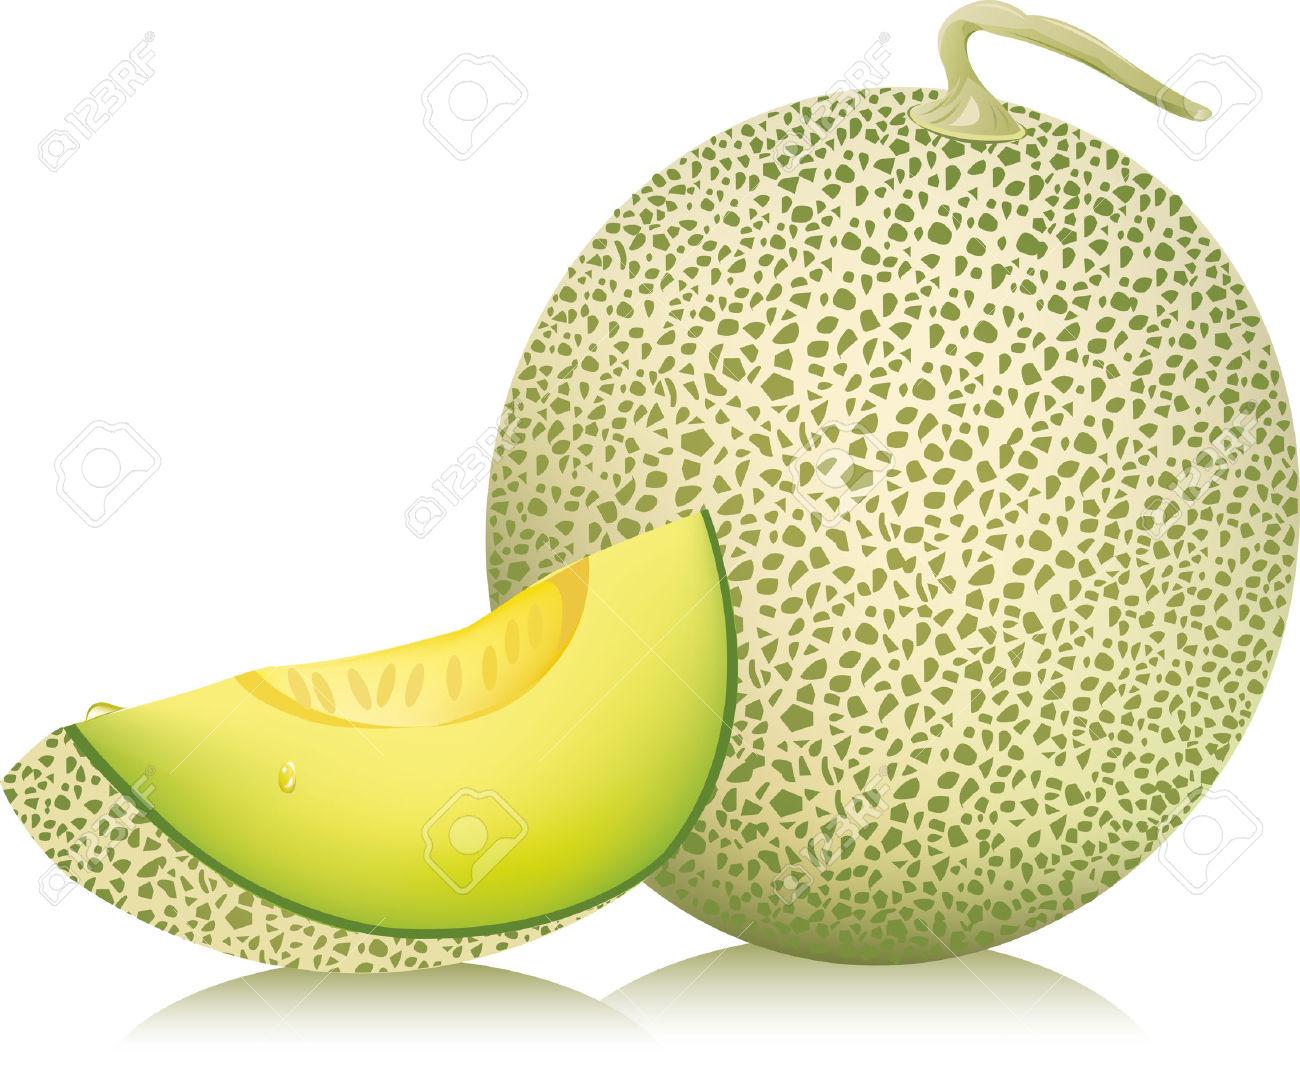 1300x1082 > Melon Wallpapers